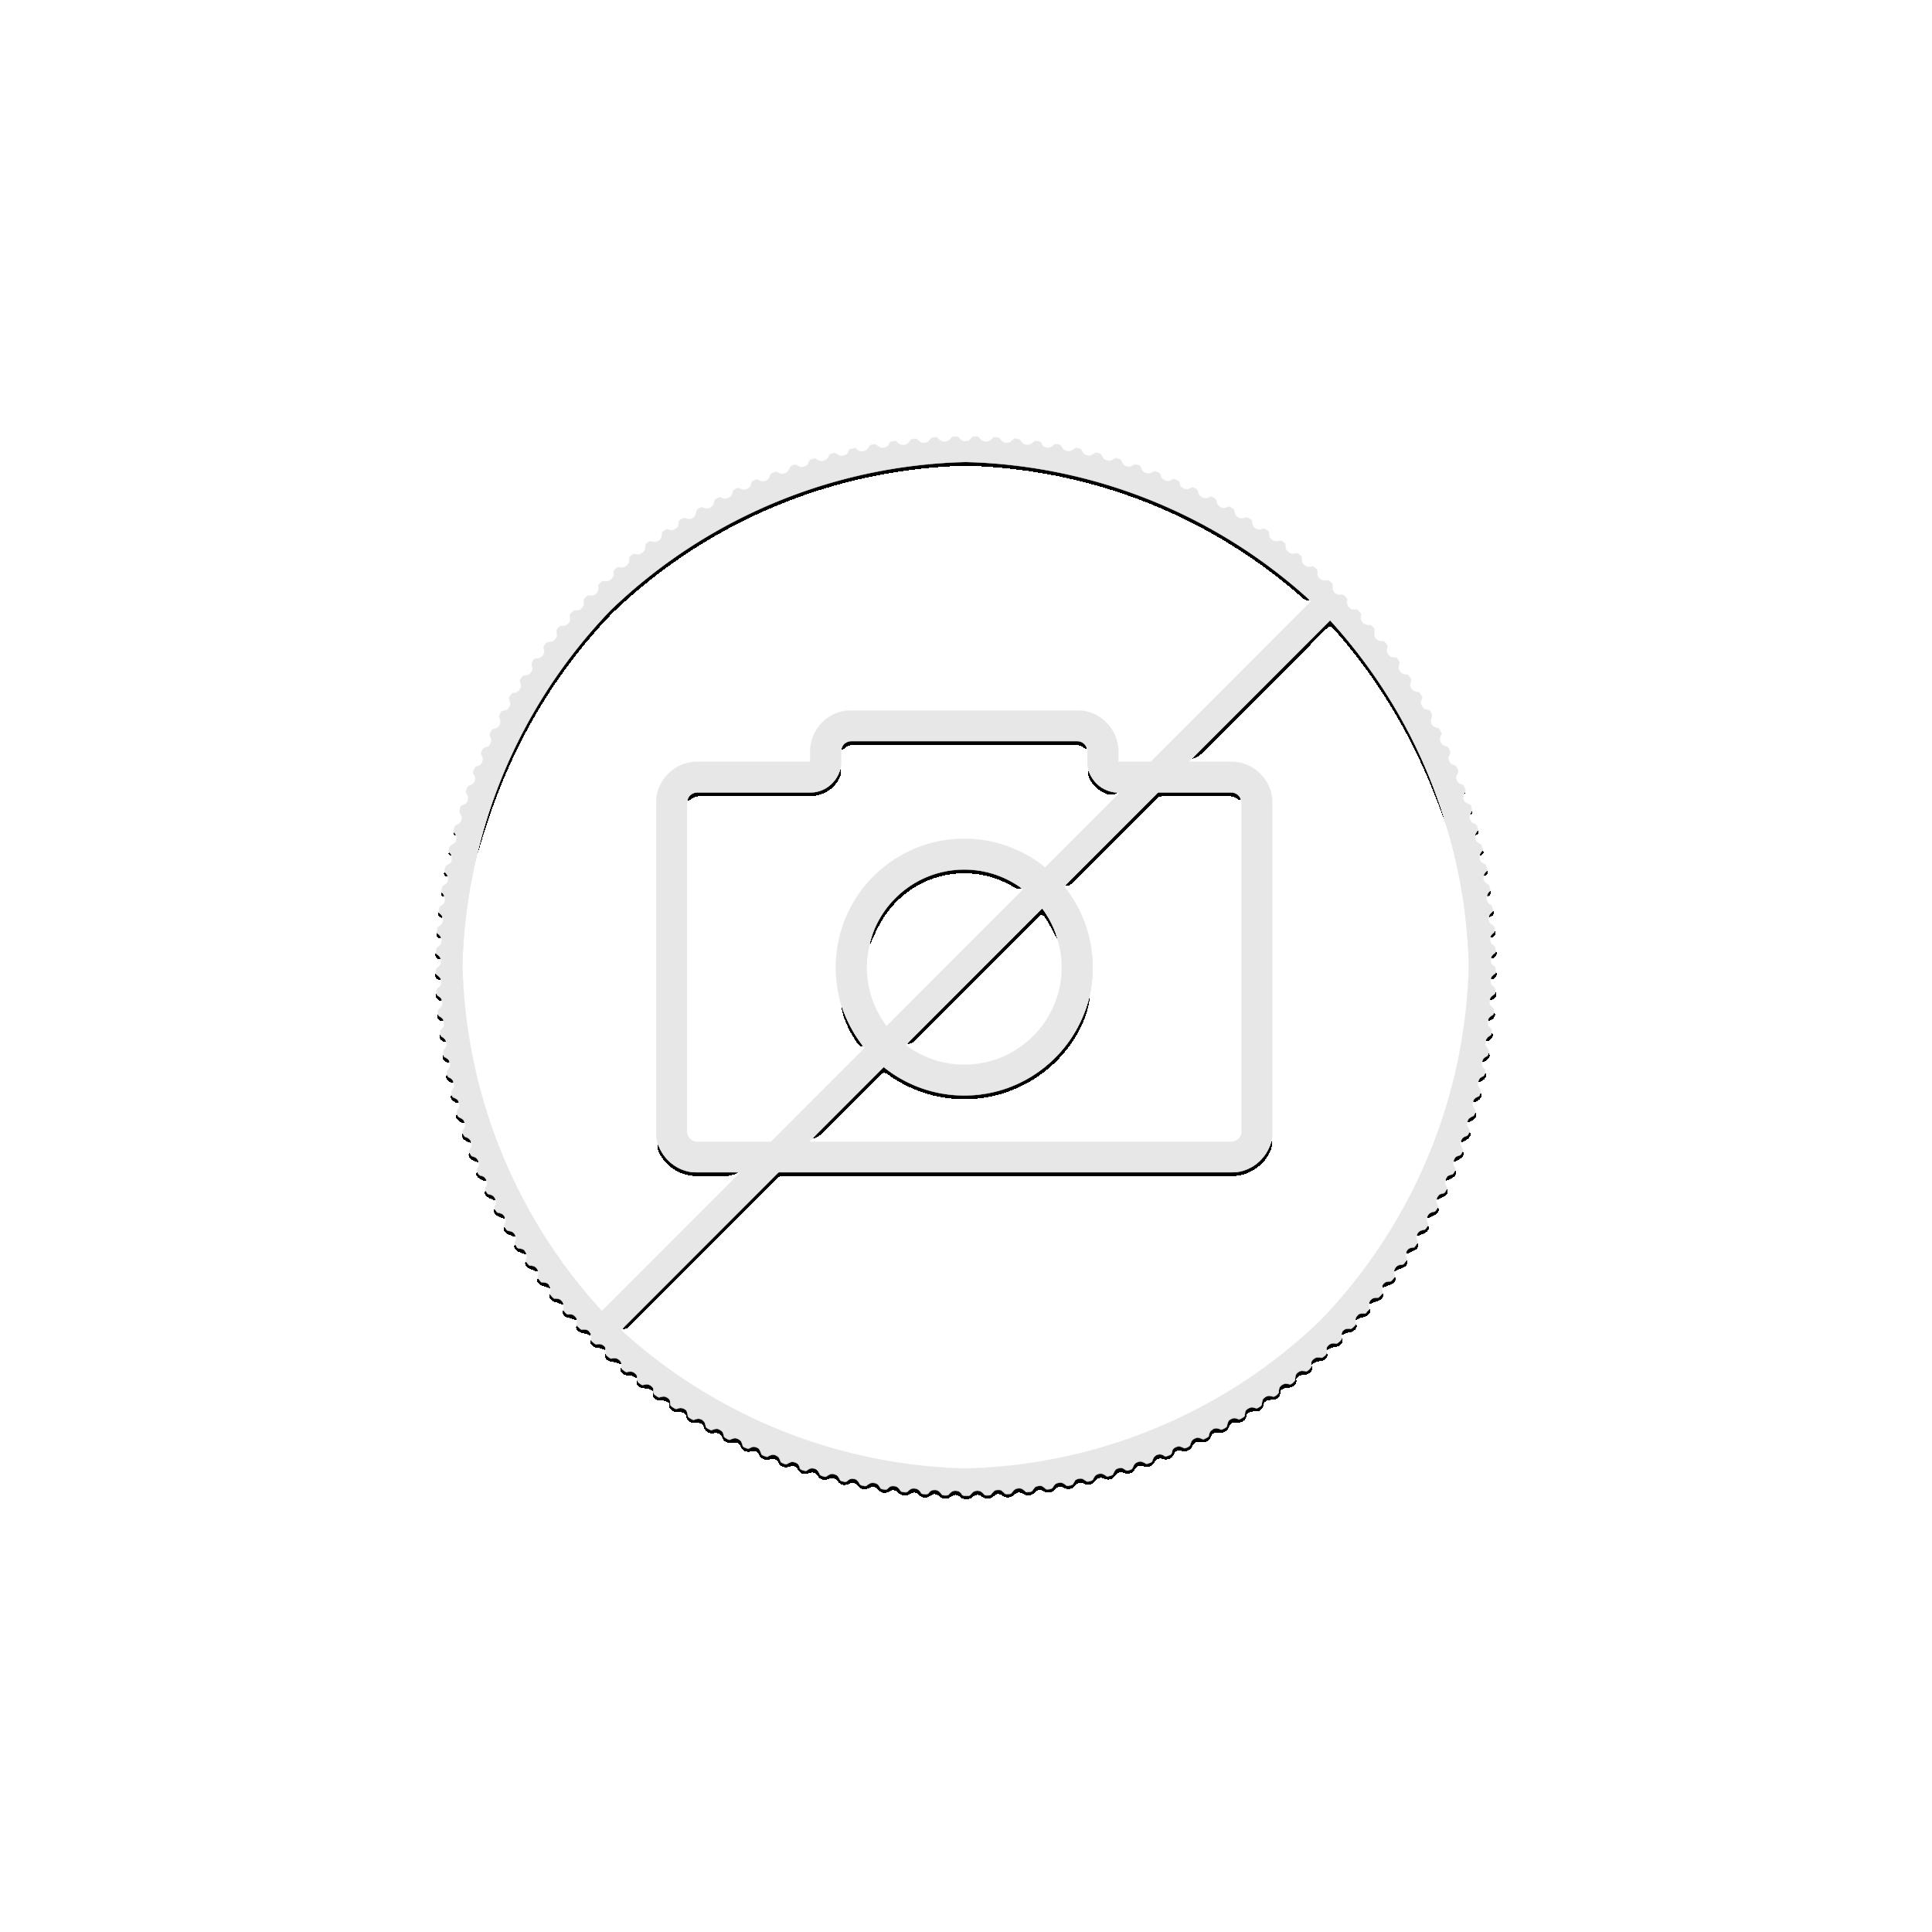 1 Kilo Kookaburra silver coin 2014